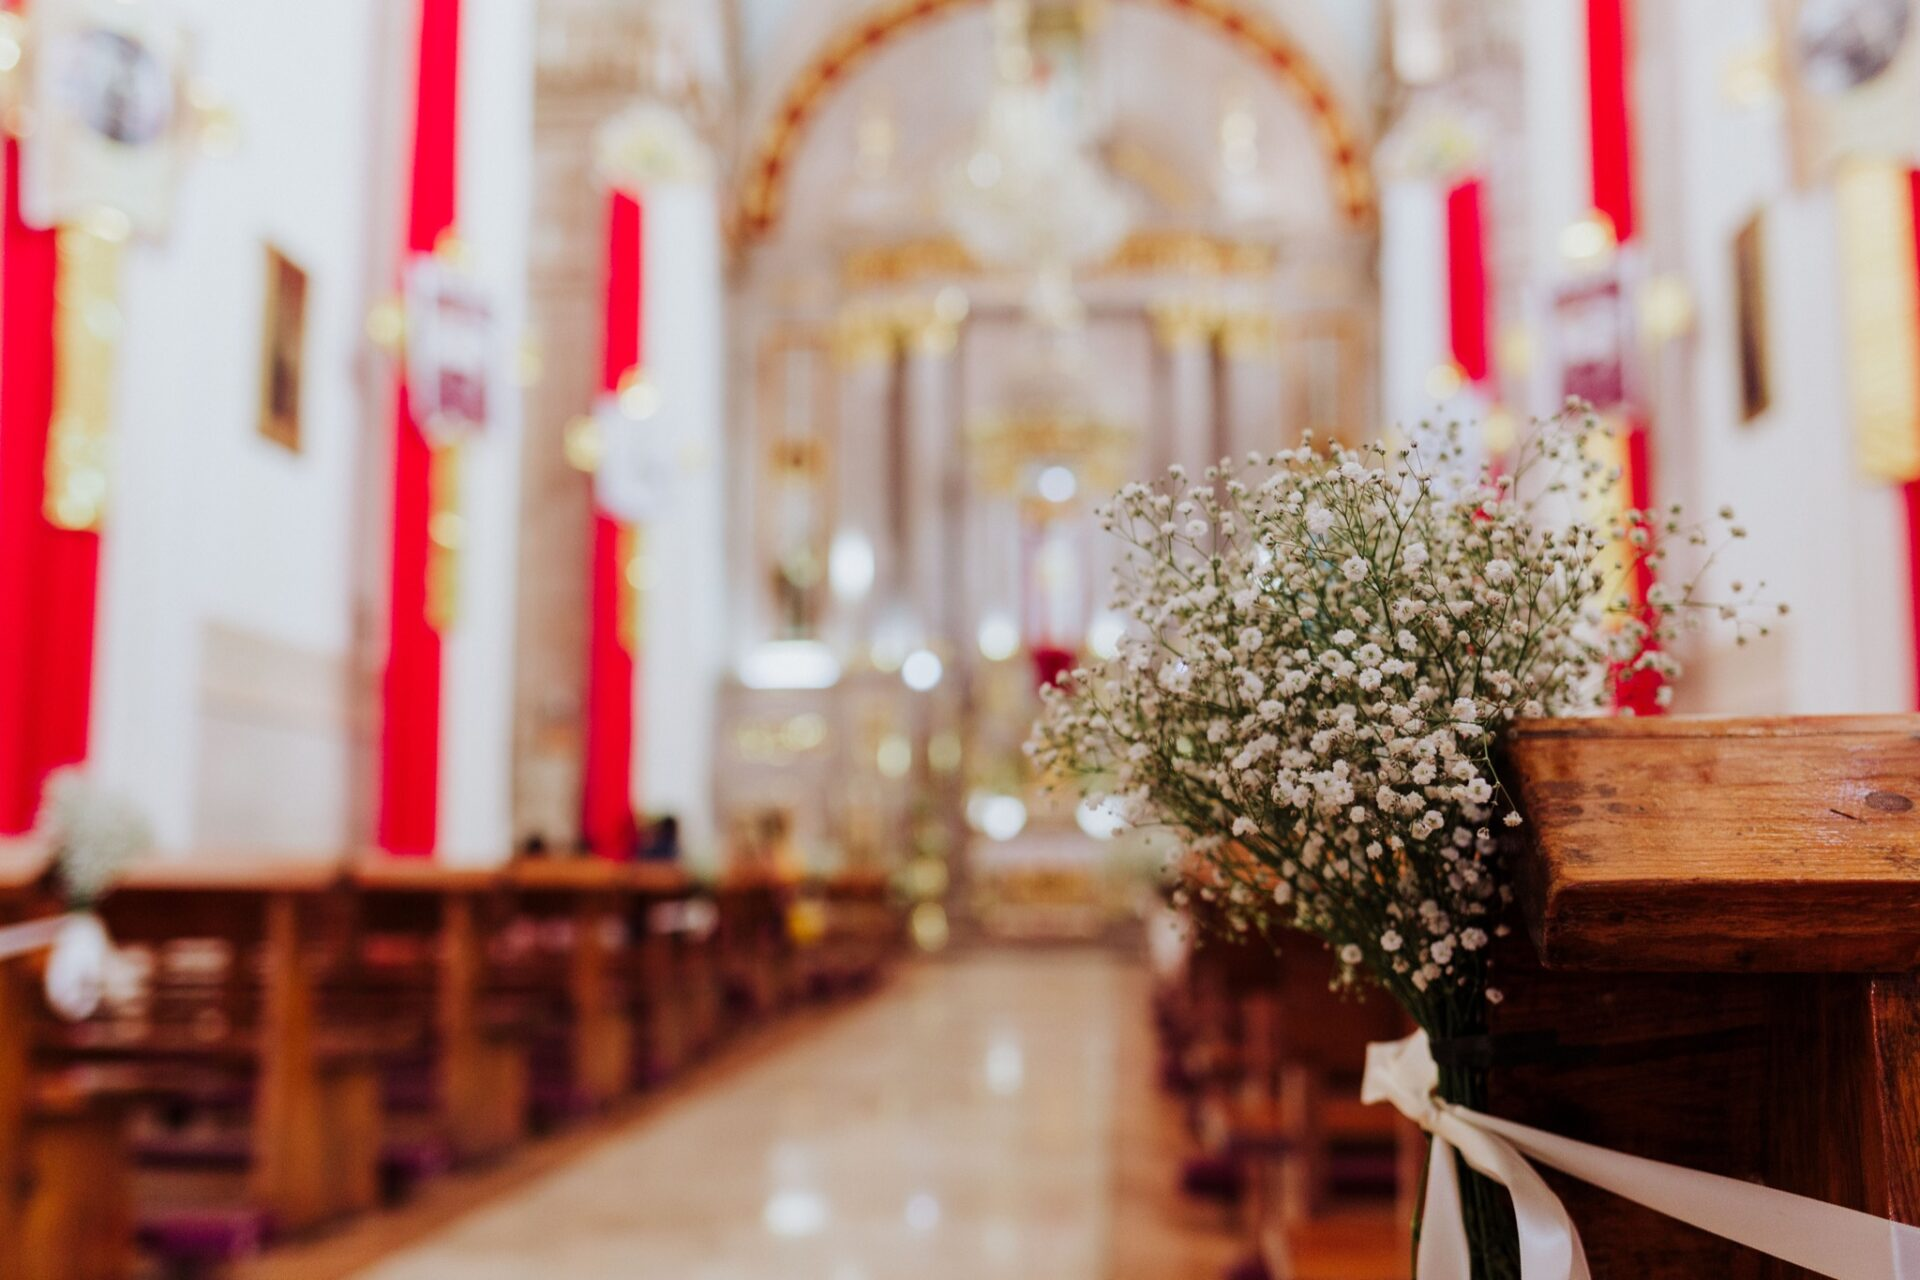 javier_noriega_fotografo_bodas_teul_zacatecas_wedding_photographer2a